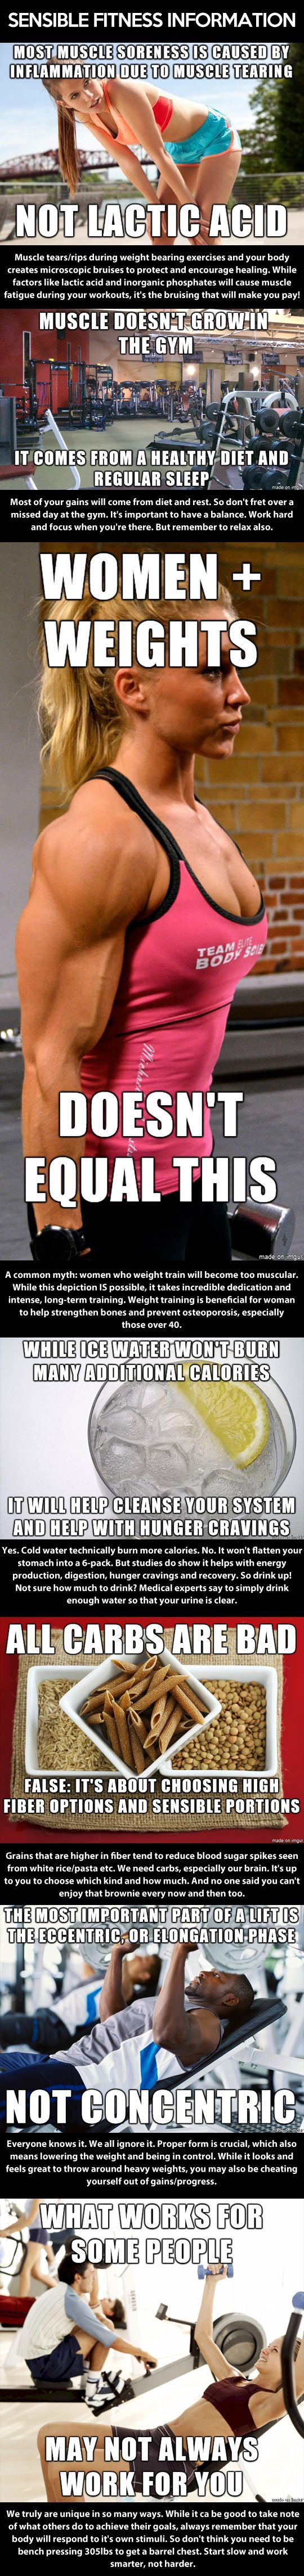 Sensible fitness information.